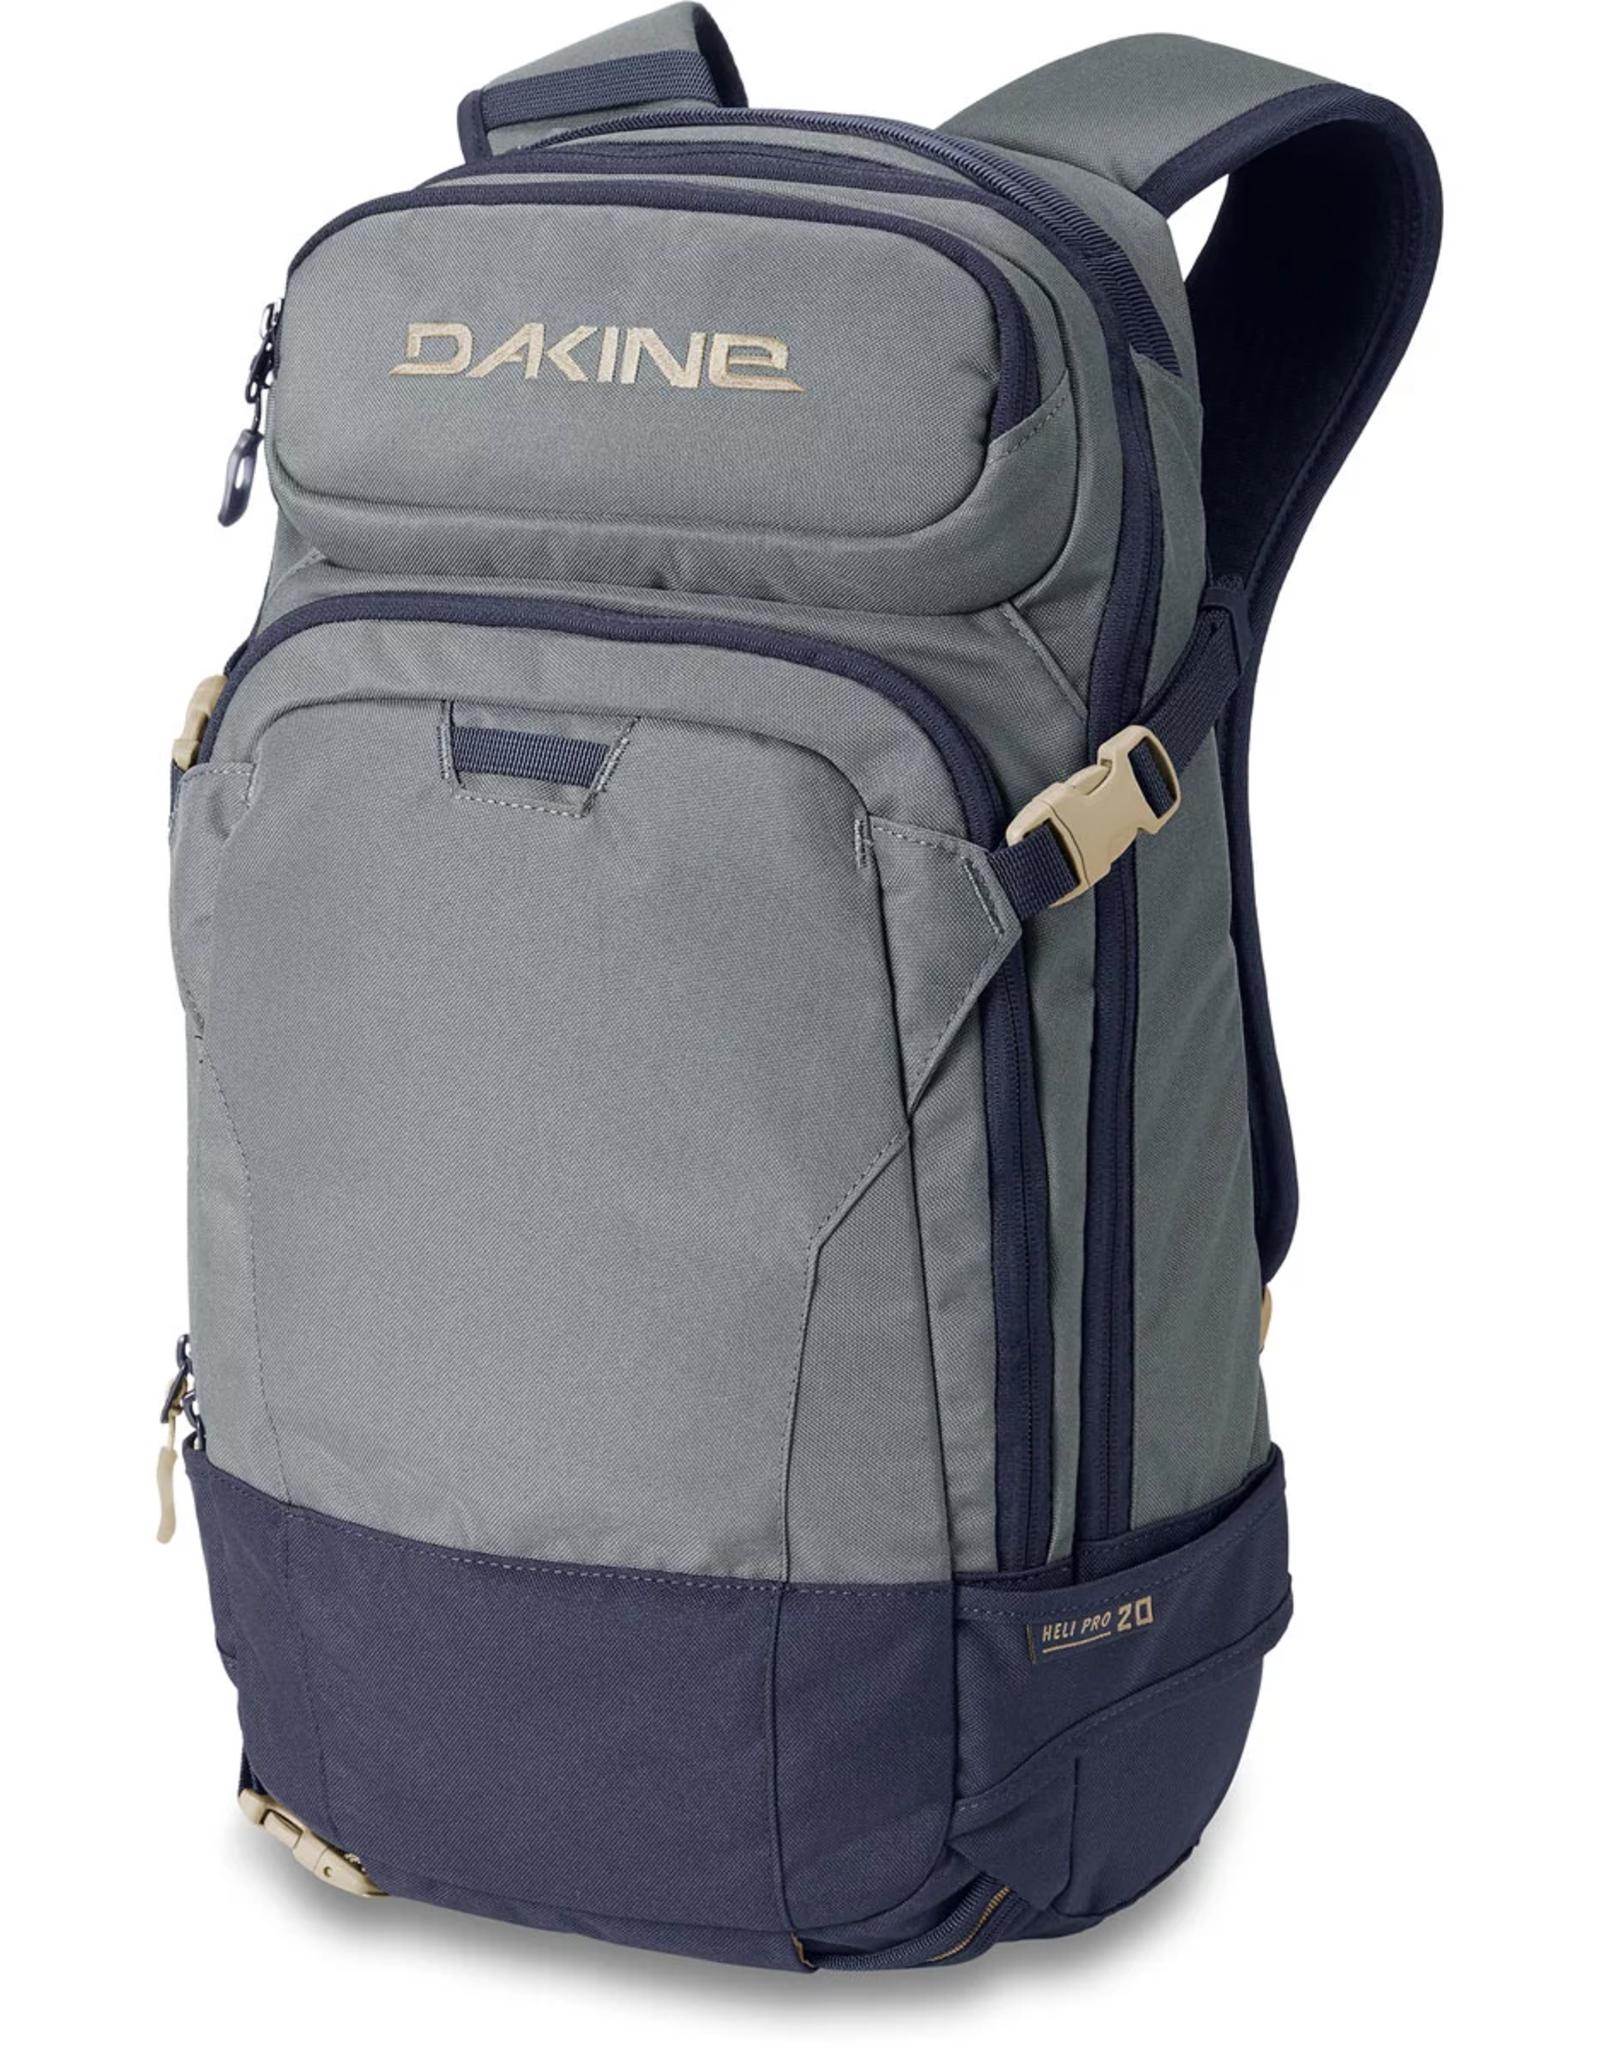 Dakine Dakine - HELI PRO 20L - Dark Slate